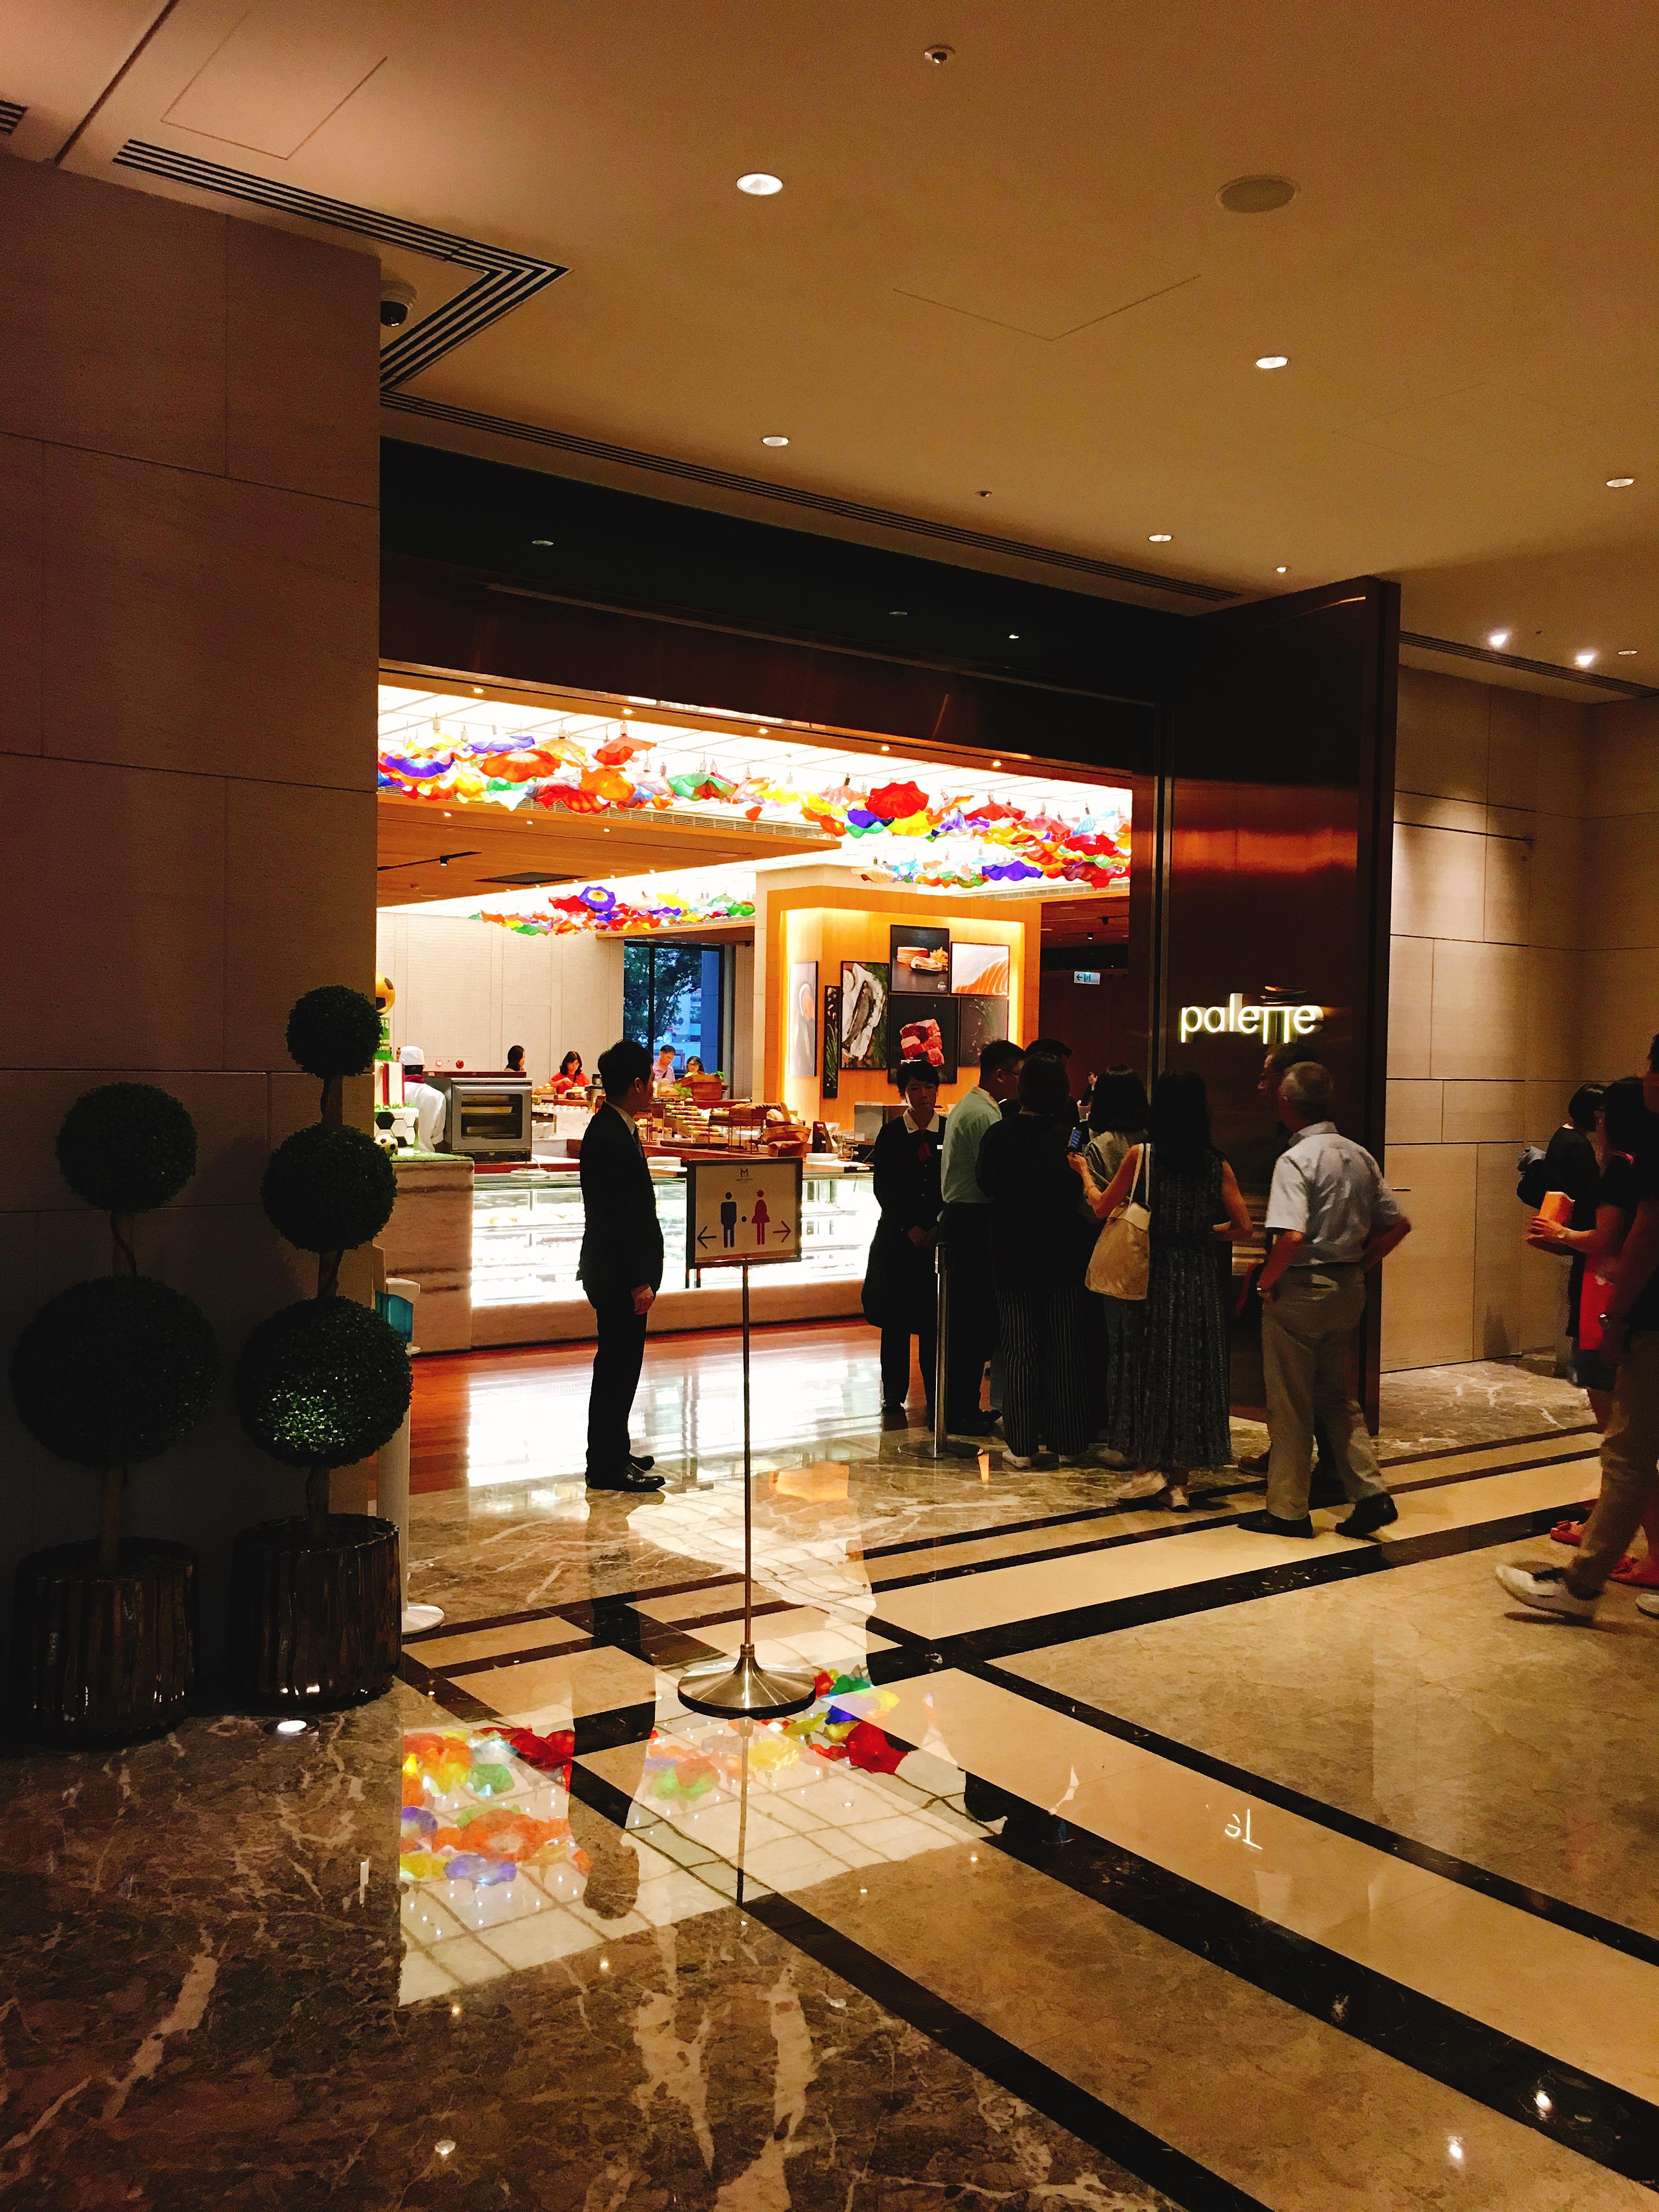 Photo of 【美食】大直美福大飯店彩匯自助餐 | 甜點 | 和牛 | 龍蝦 | 吃到飽(Grand Mayfull Hotel Taipei)